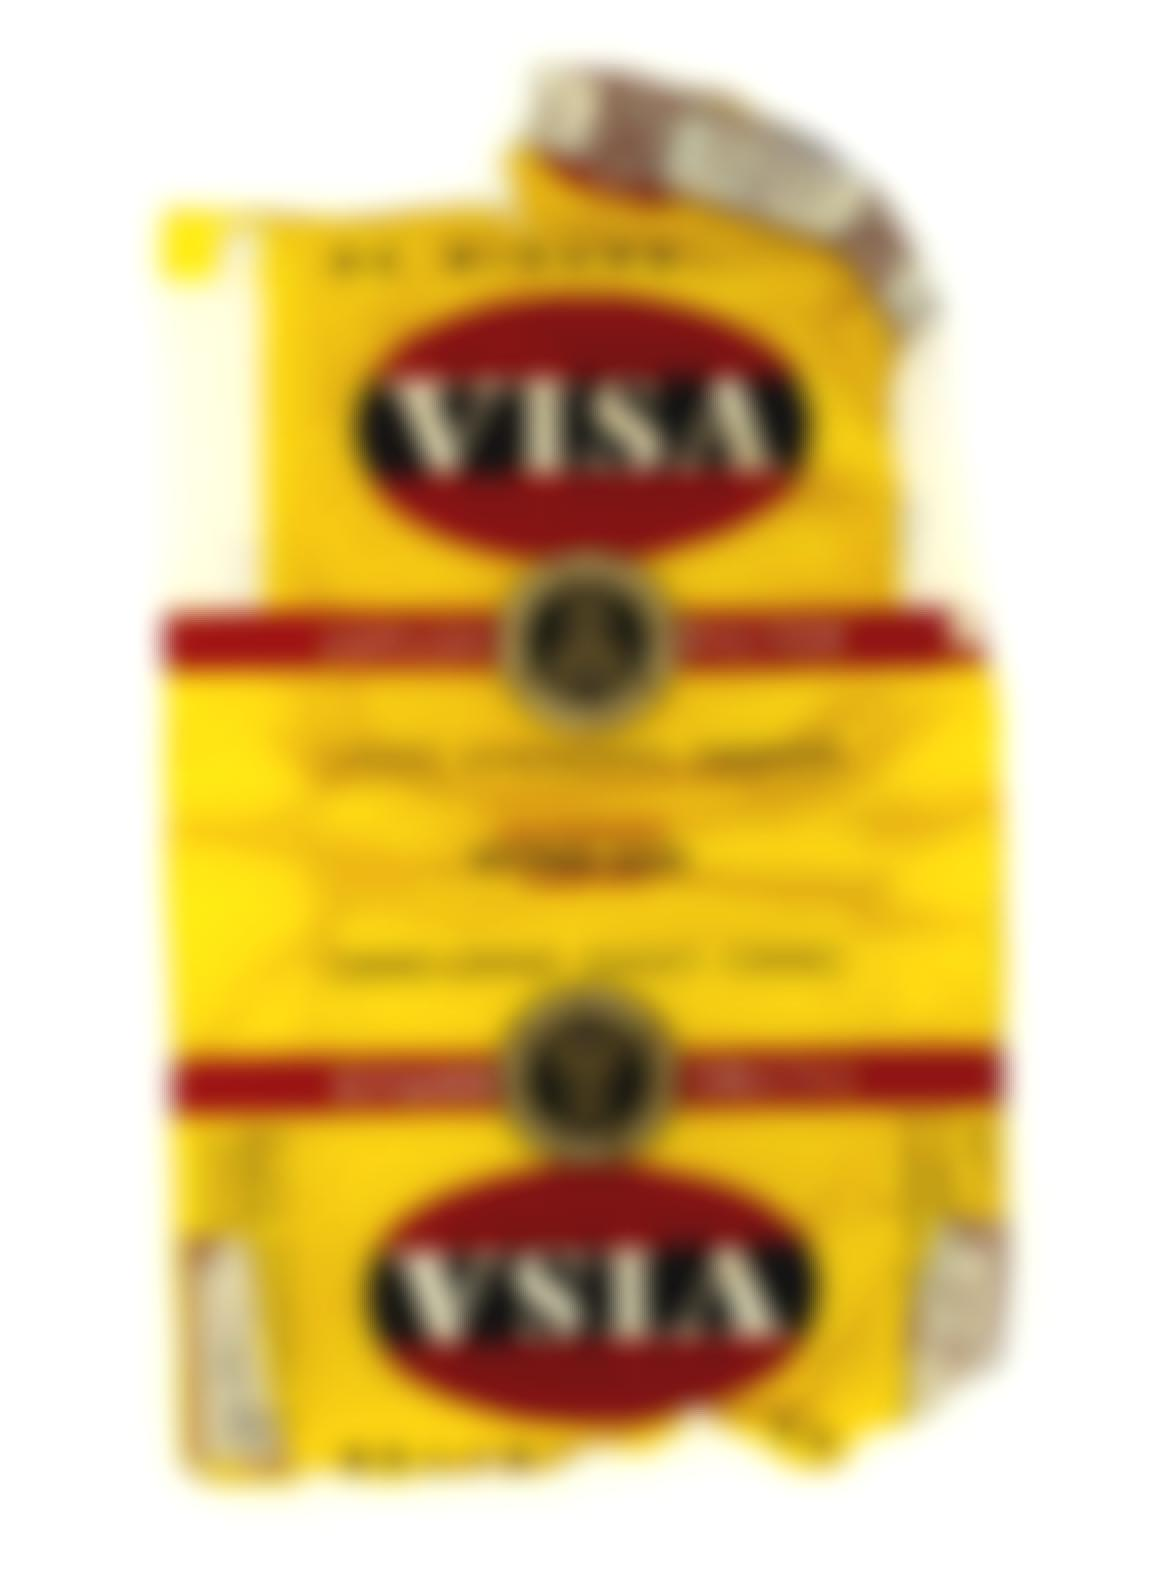 Sir Peter Blake - Fag Packets (Visa, La Ronde, Fifth Avenue And Boule)-2005